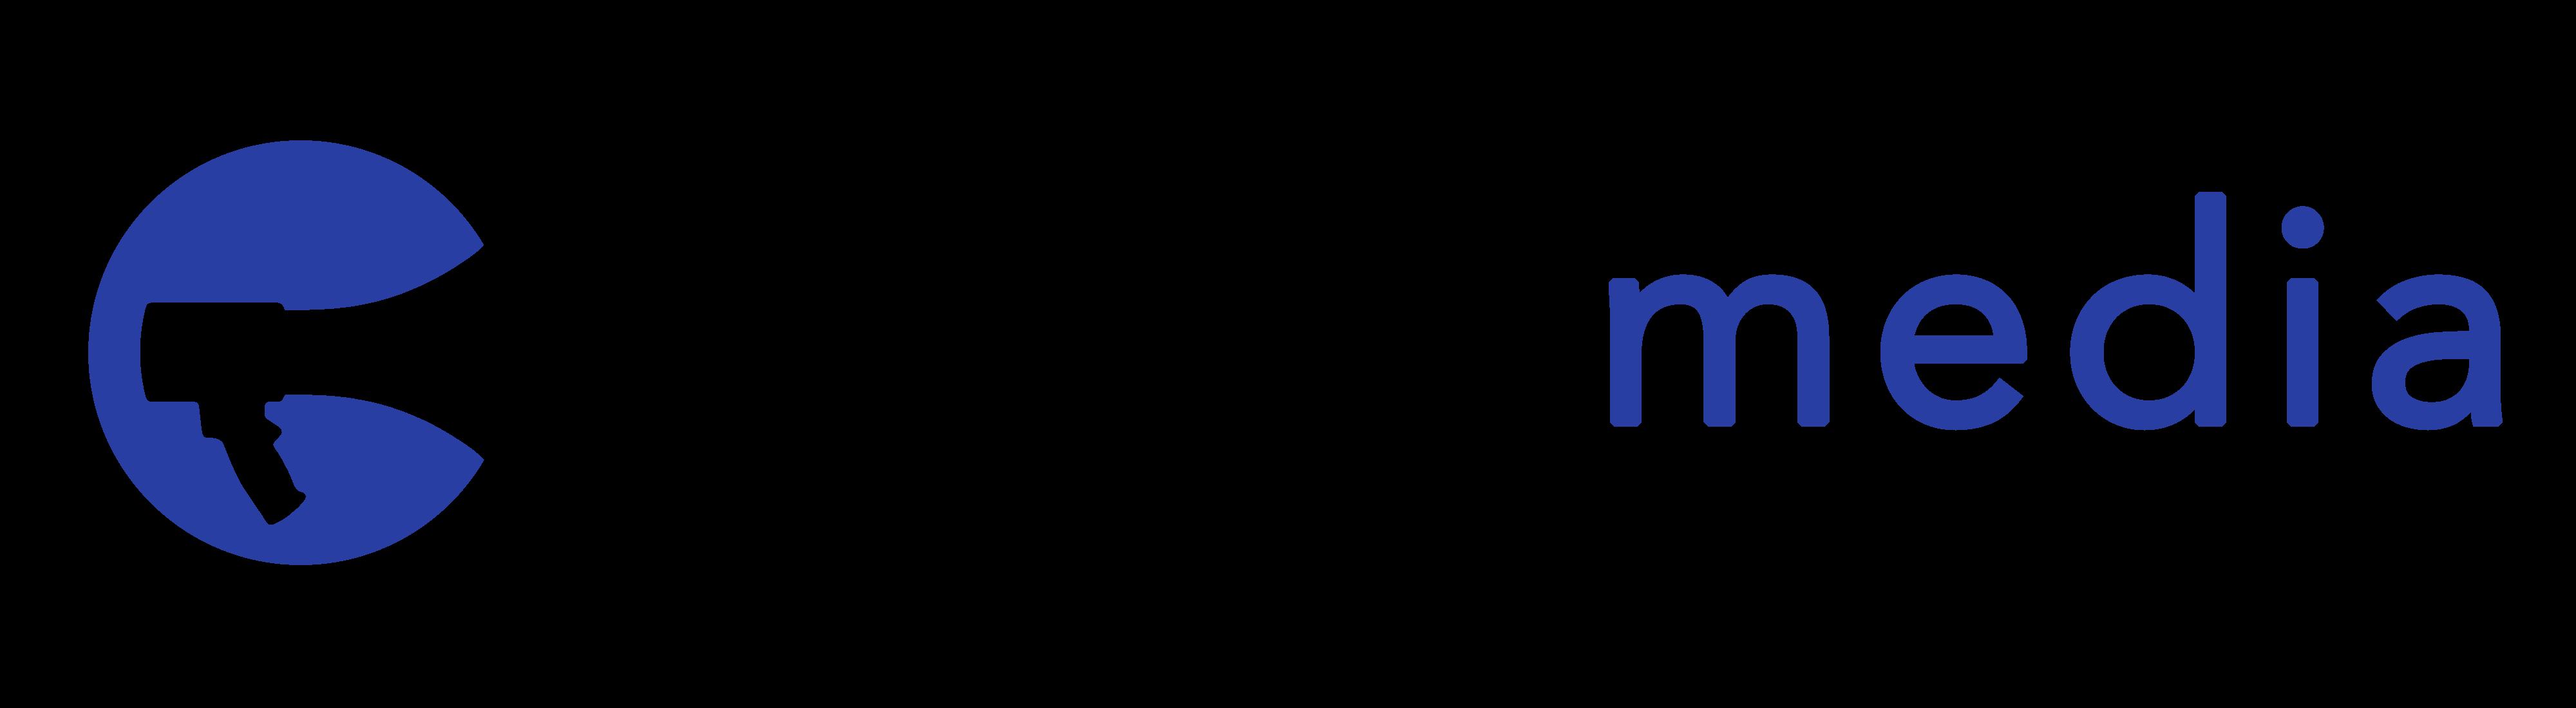 Makeitmedia-Logo7-Transparent-PMS